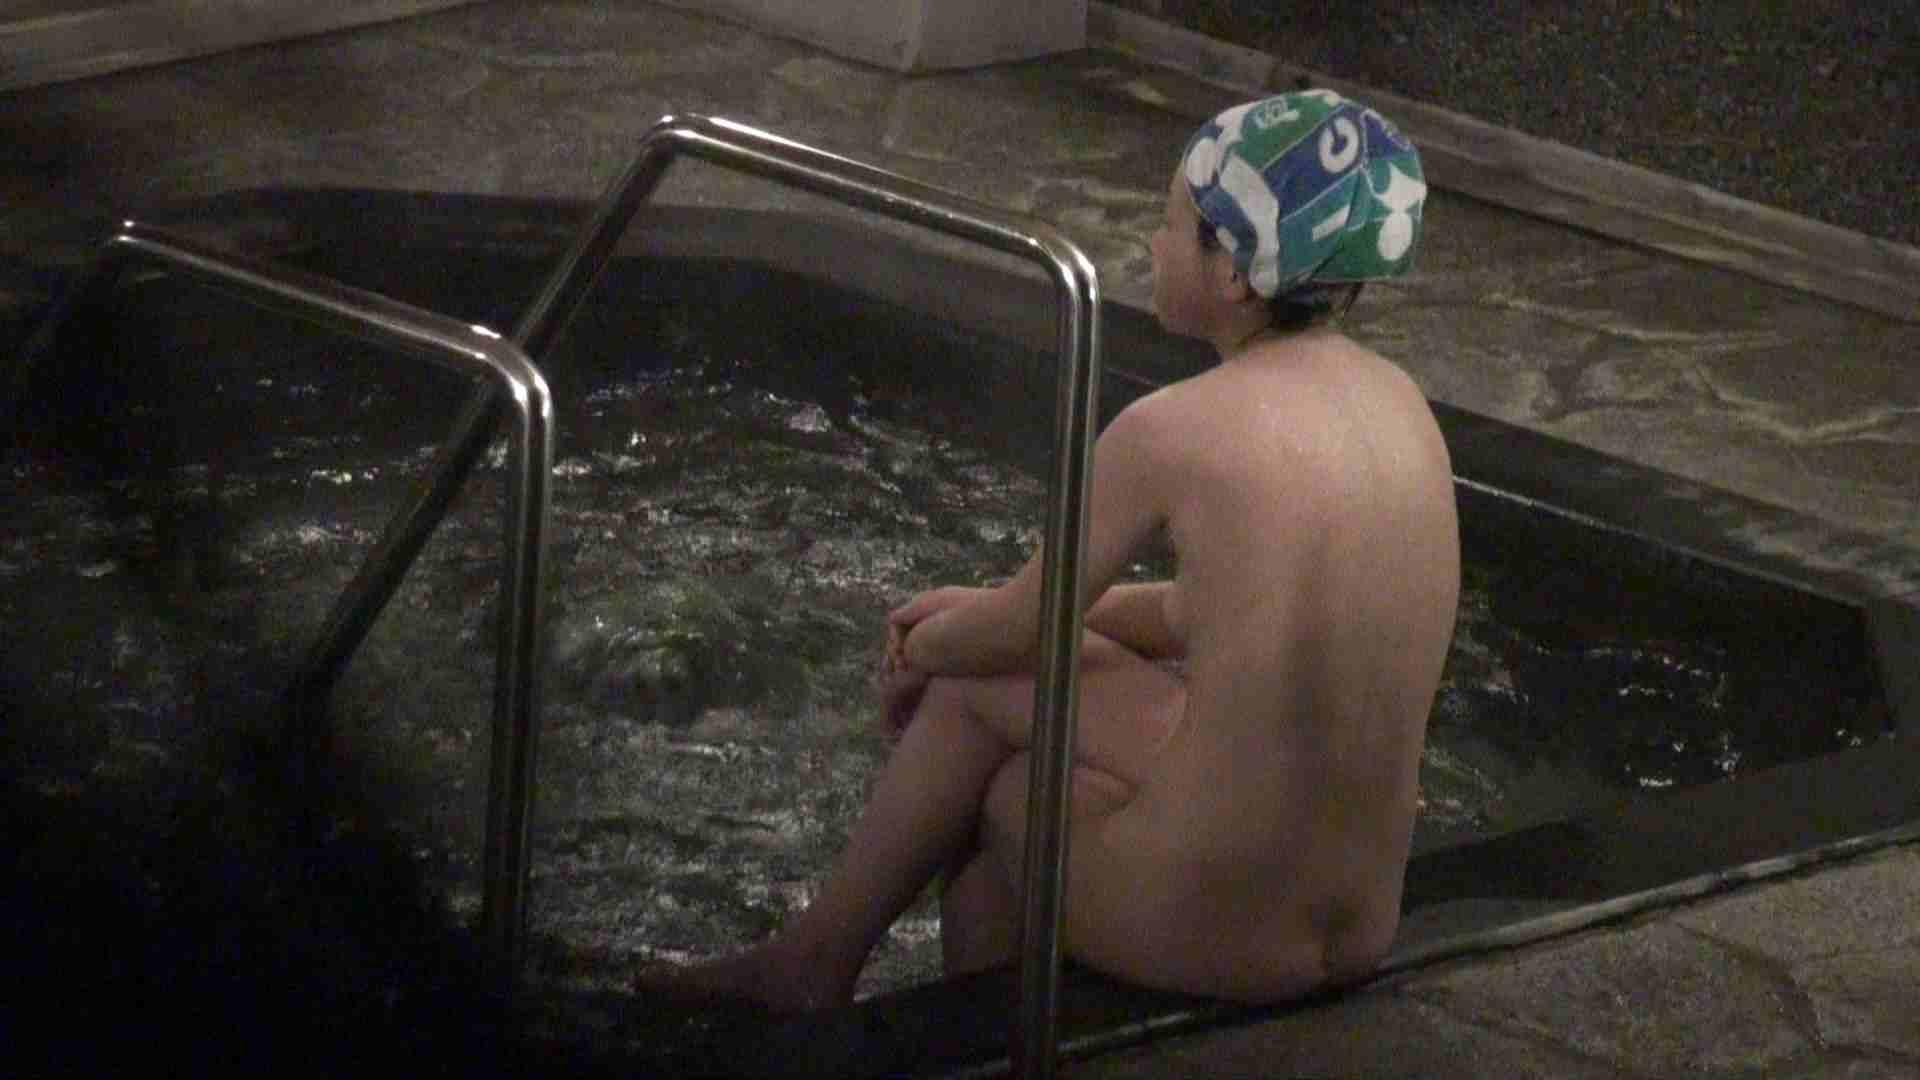 Aquaな露天風呂Vol.346 盗撮 オマンコ動画キャプチャ 109画像 50